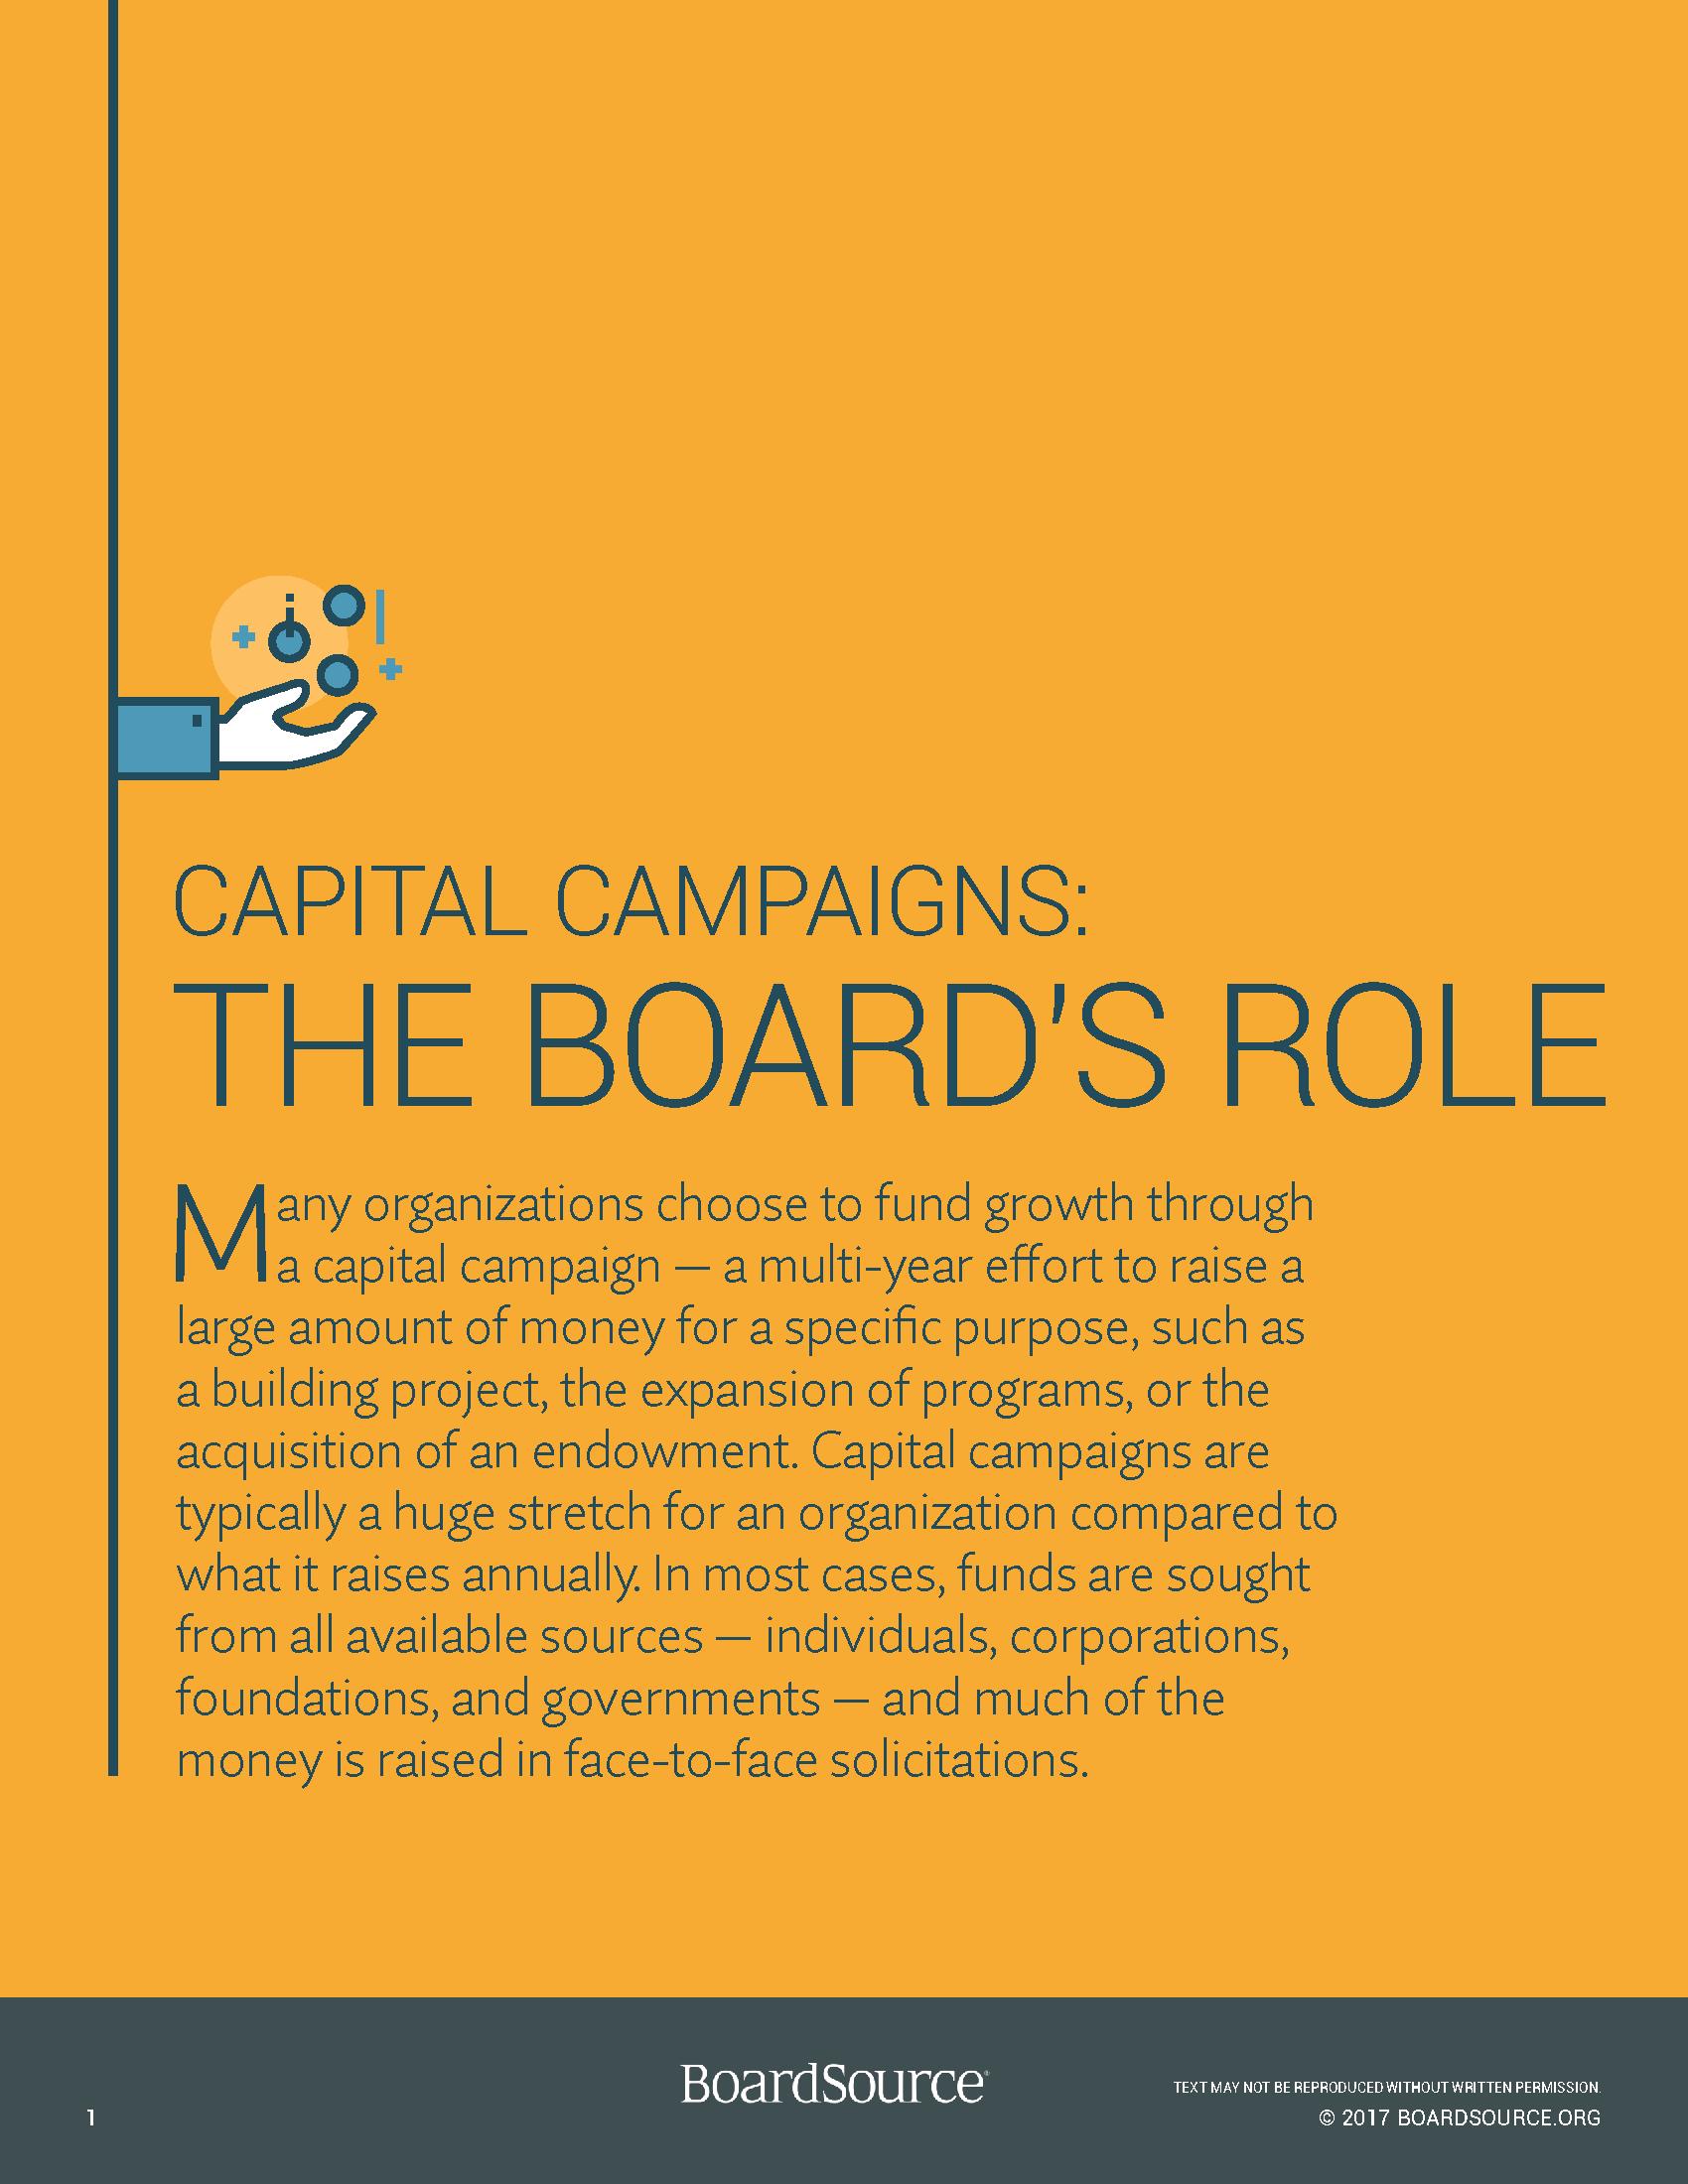 Capital Campaigns - The Board's Role